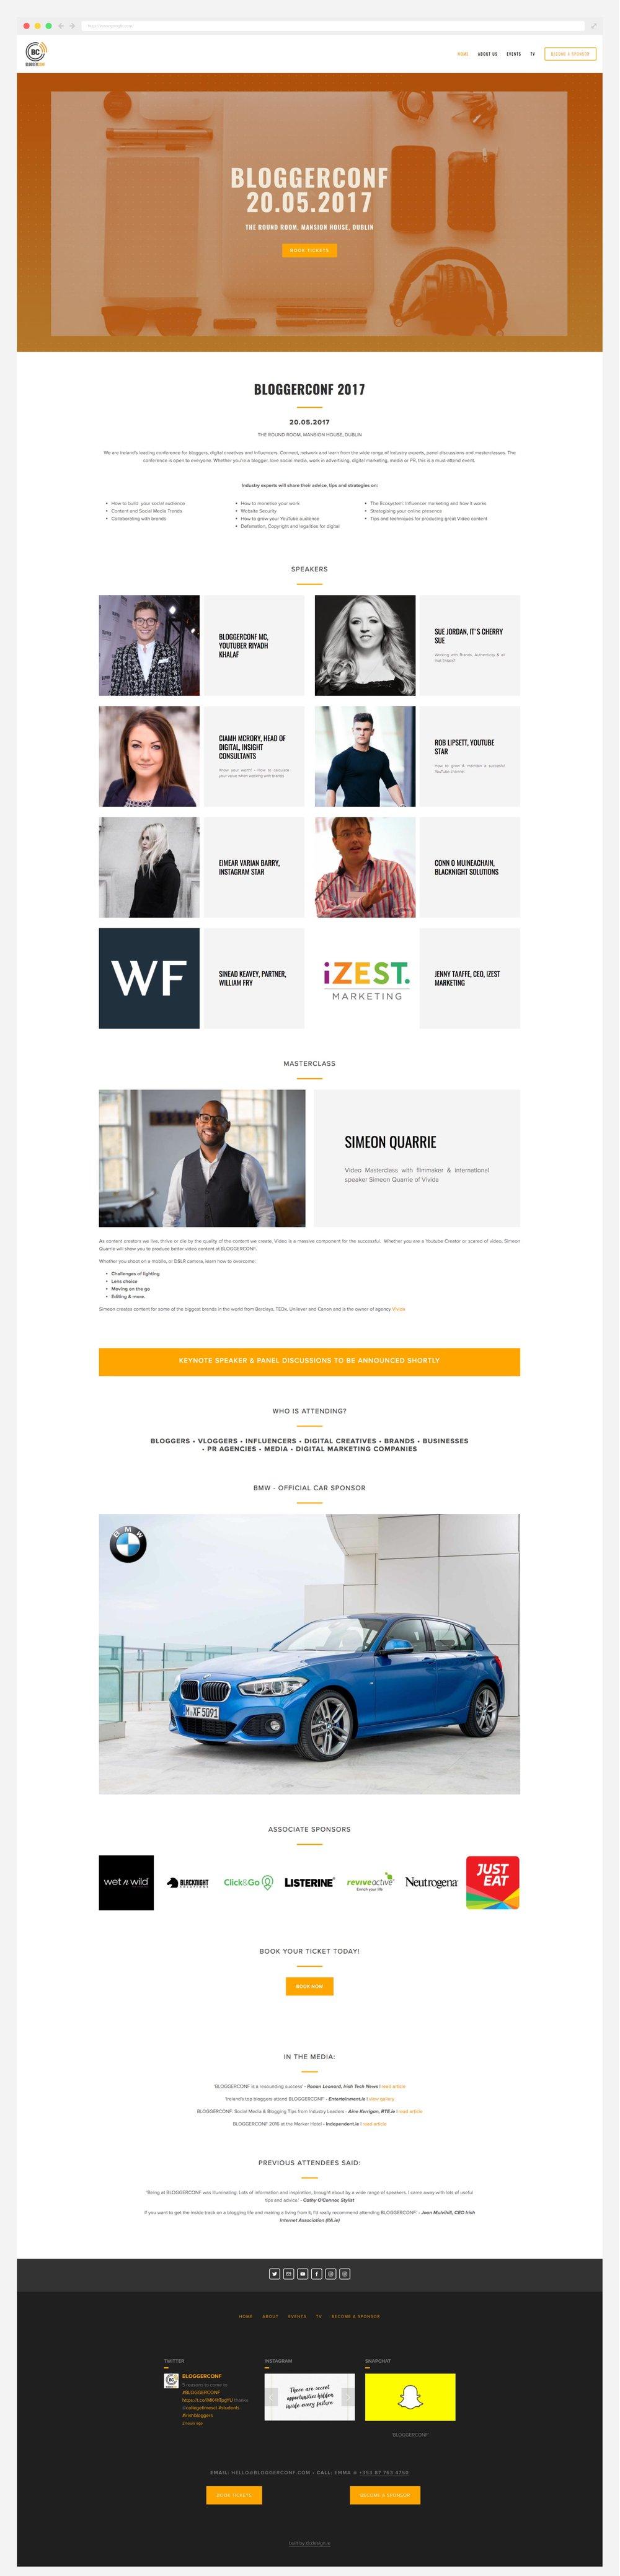 Bloggerconf website layout - DC Design